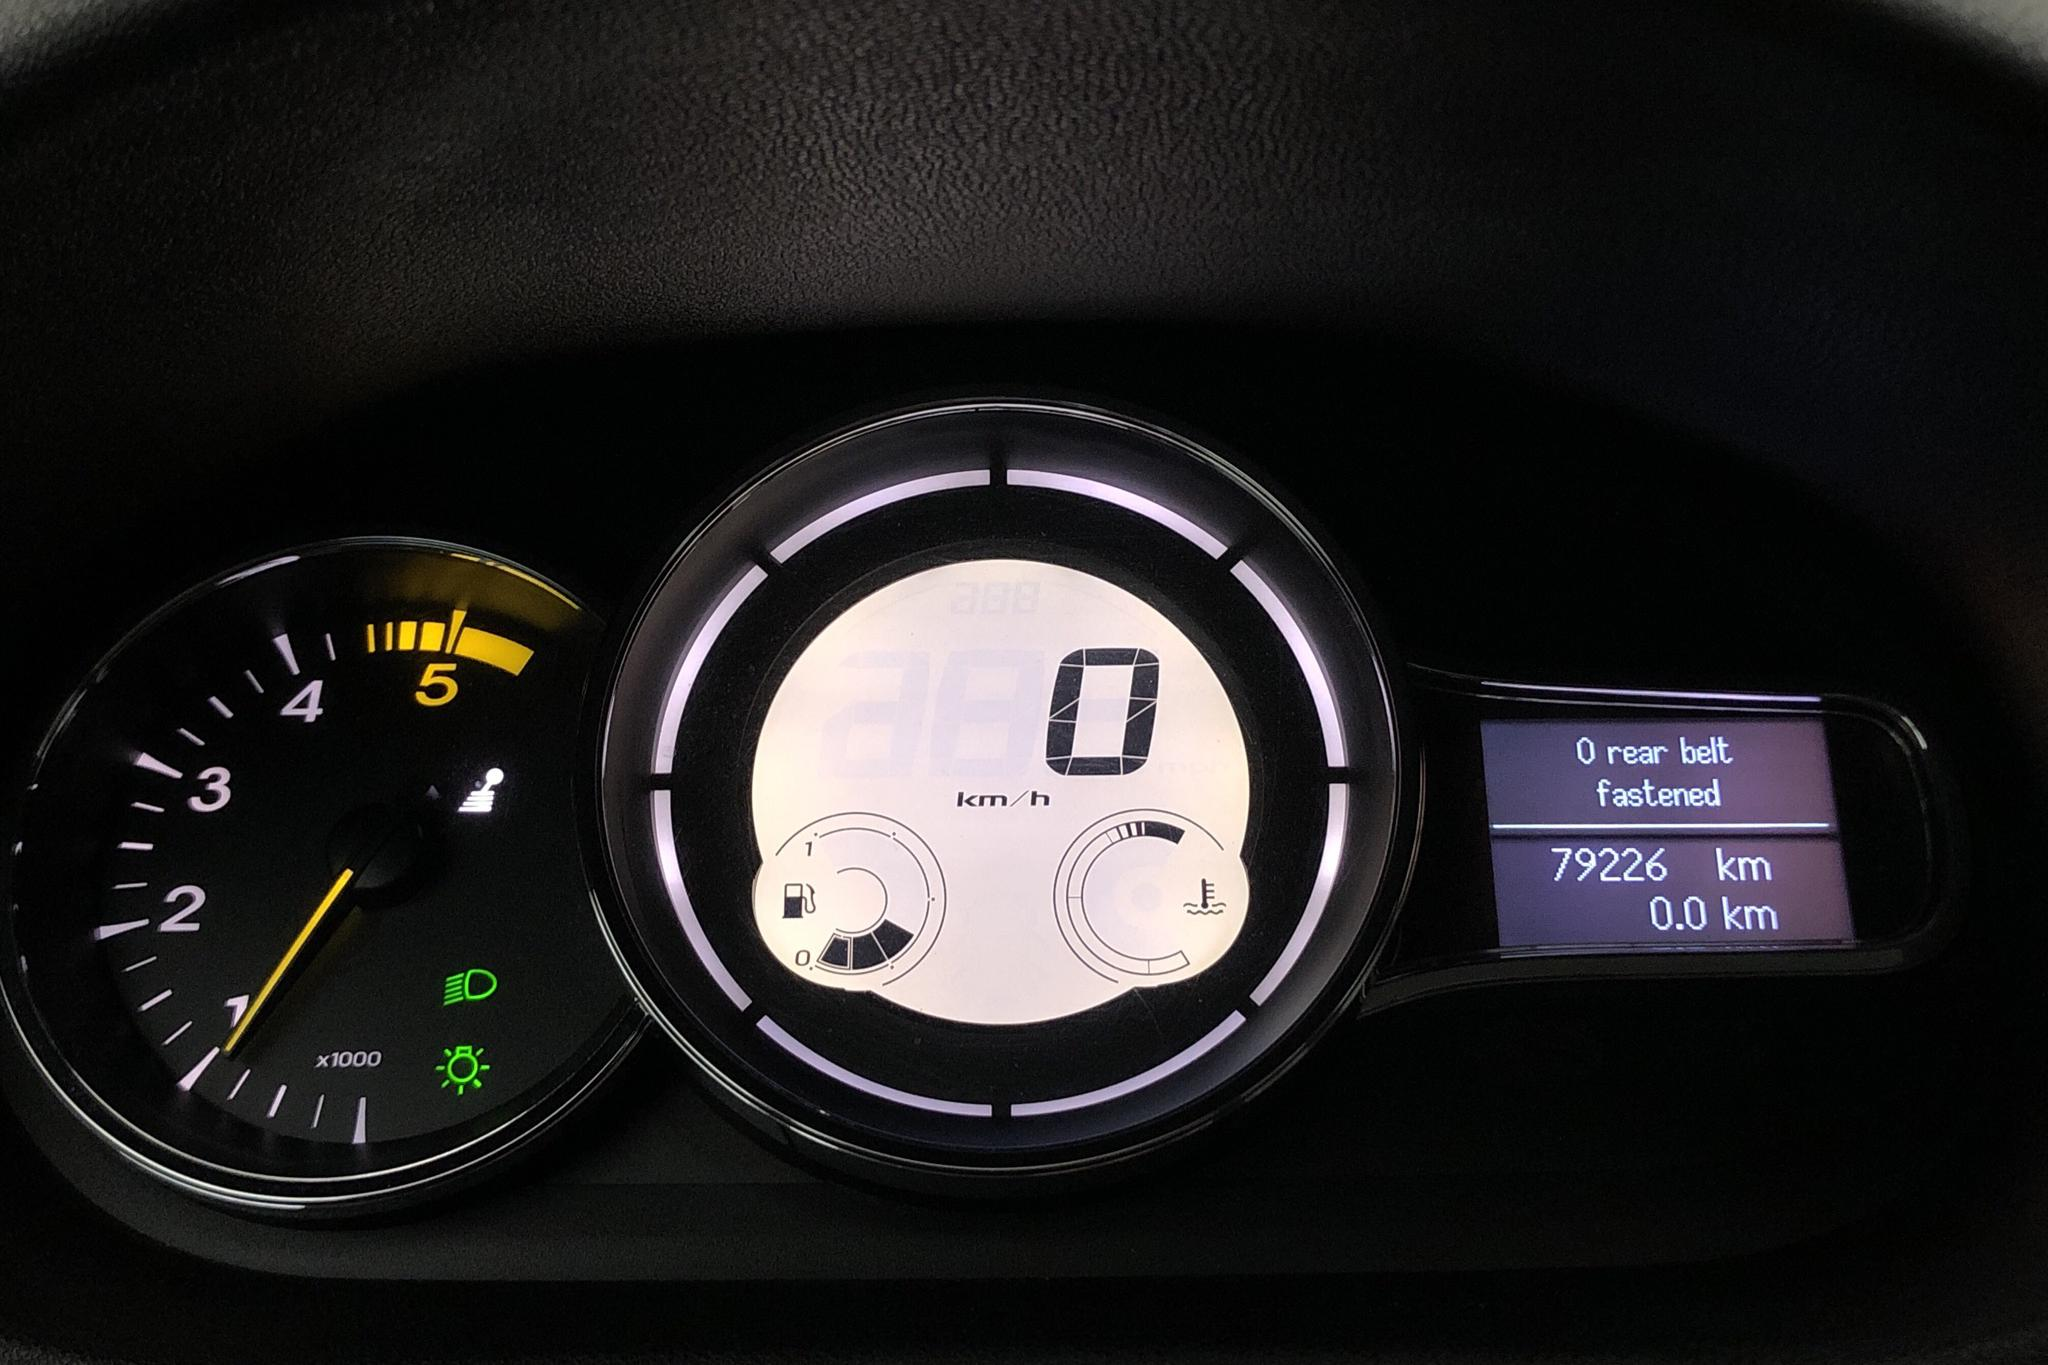 Renault Mégane Phas III 1.9 dCi Sports Tourer  (131hk) - 79 220 km - Manual - gray - 2011